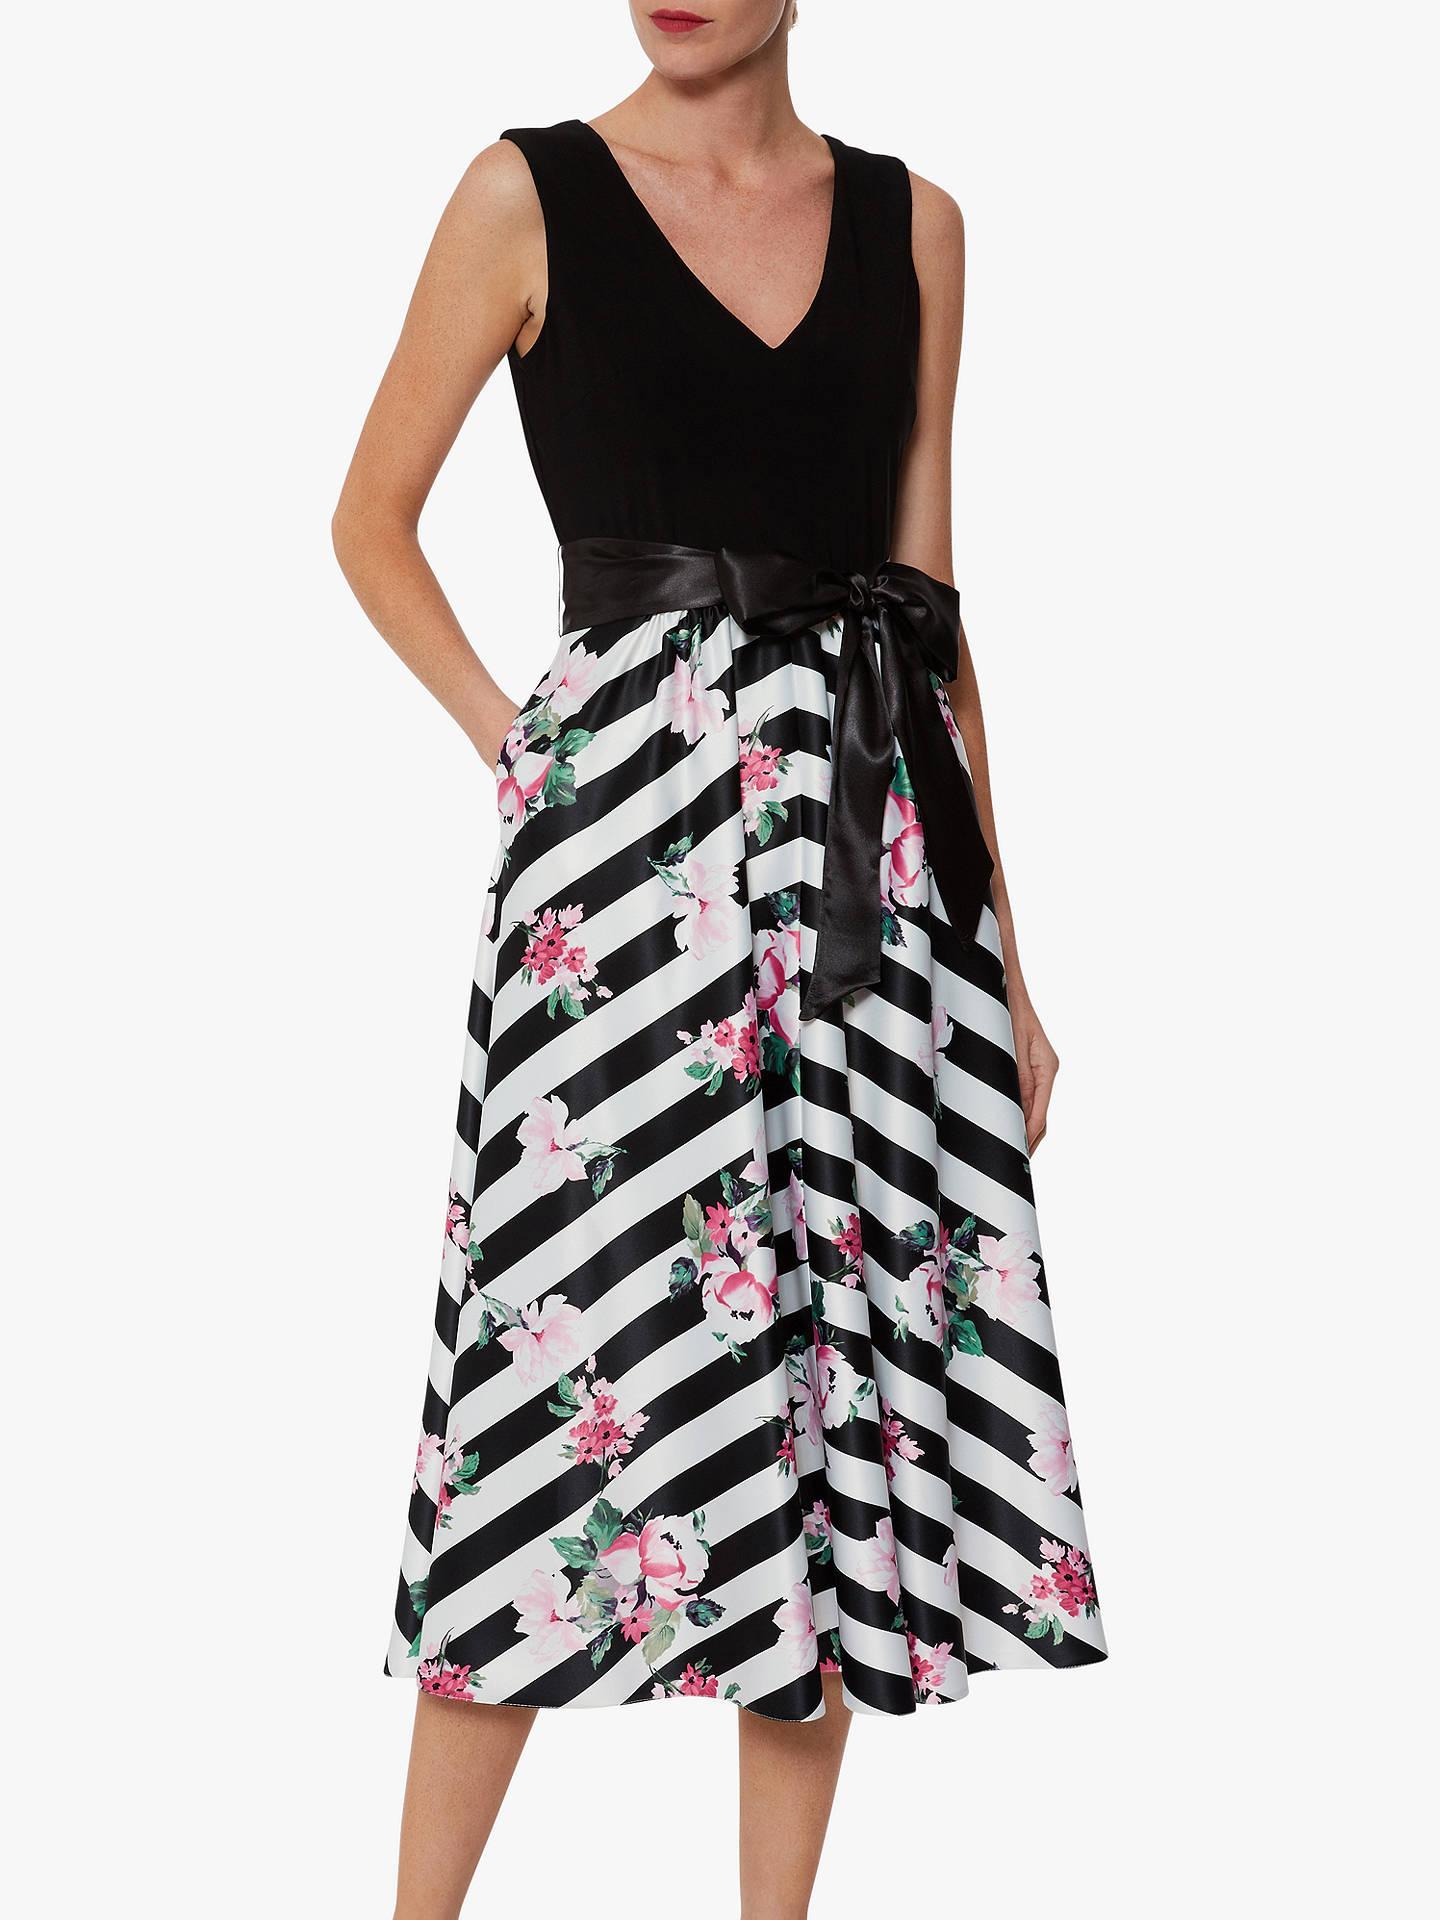 c35adb14caea5 Gina Bacconi Carlina Satin Dress, Black/White